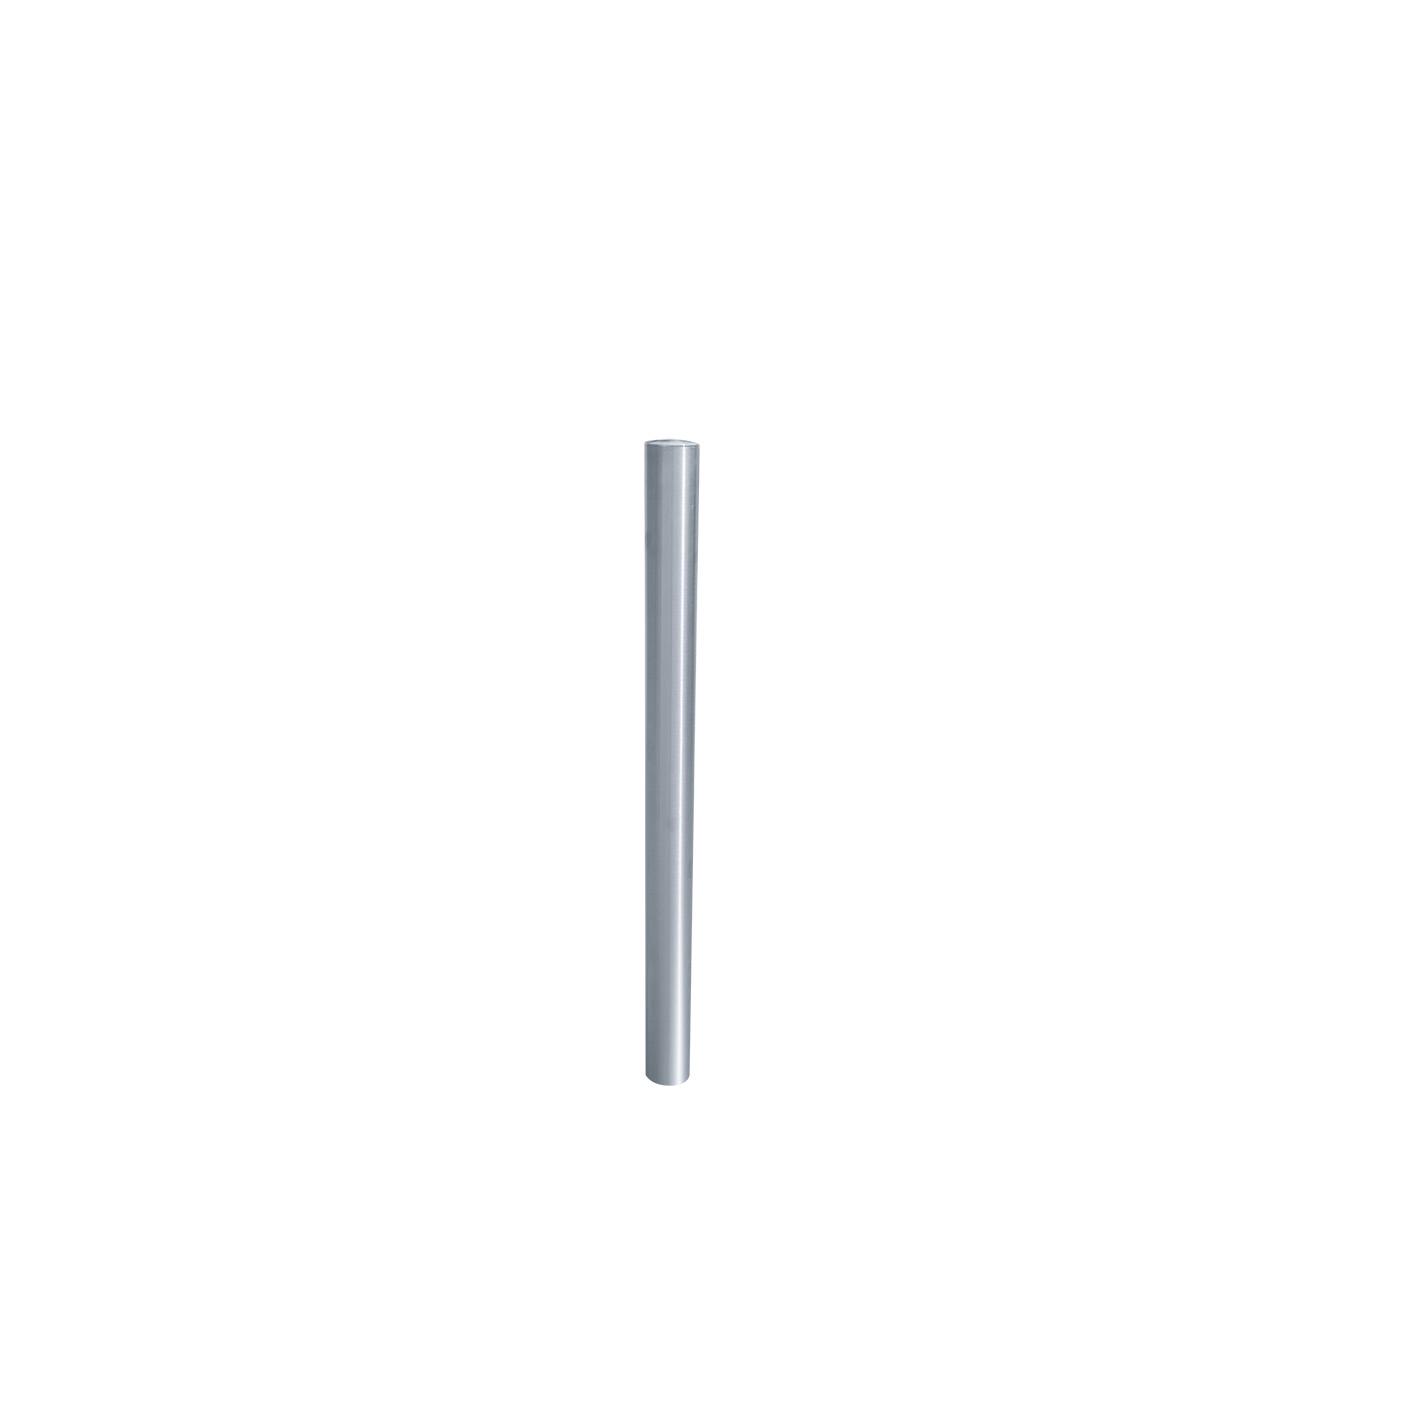 Edelstahlpfosten 4072 | Ø 76 x 900 mm